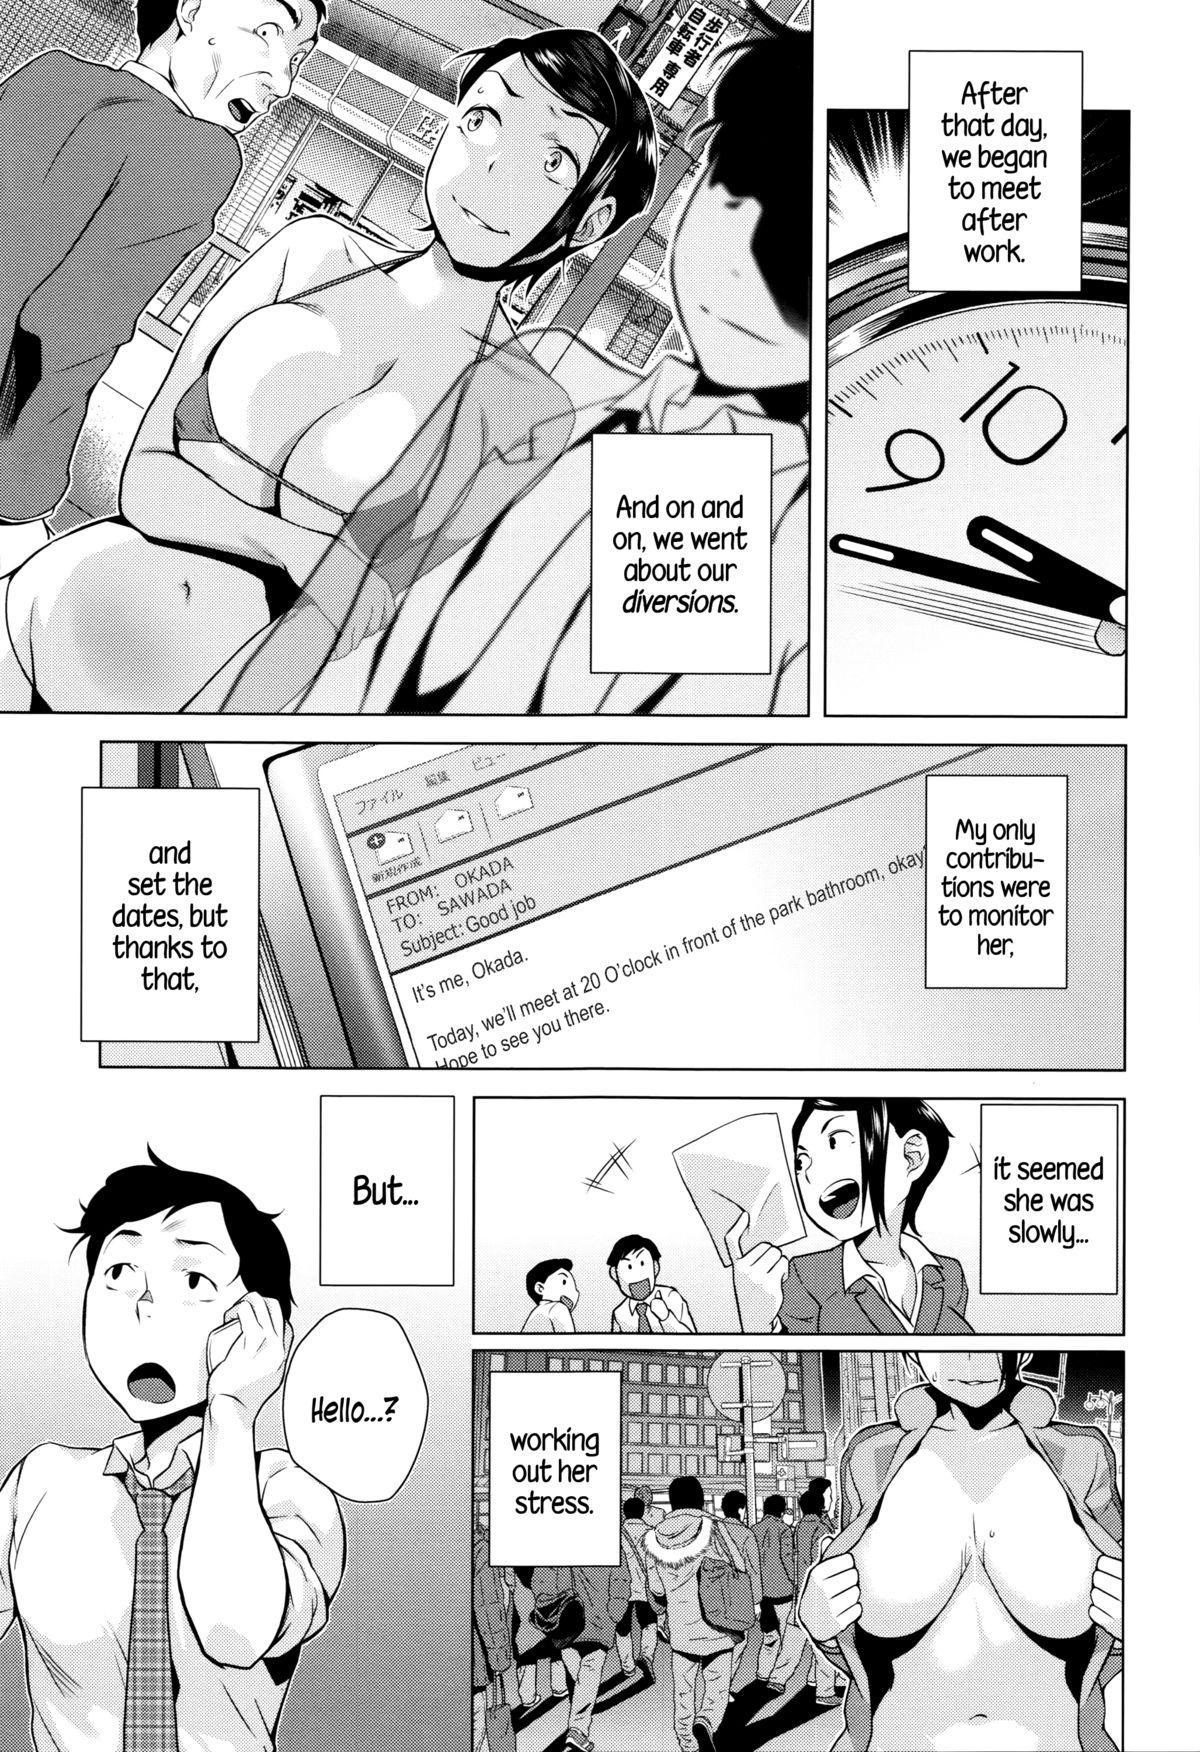 Hatsujou! Namaiki JK | Horny! Cheeky JK 199